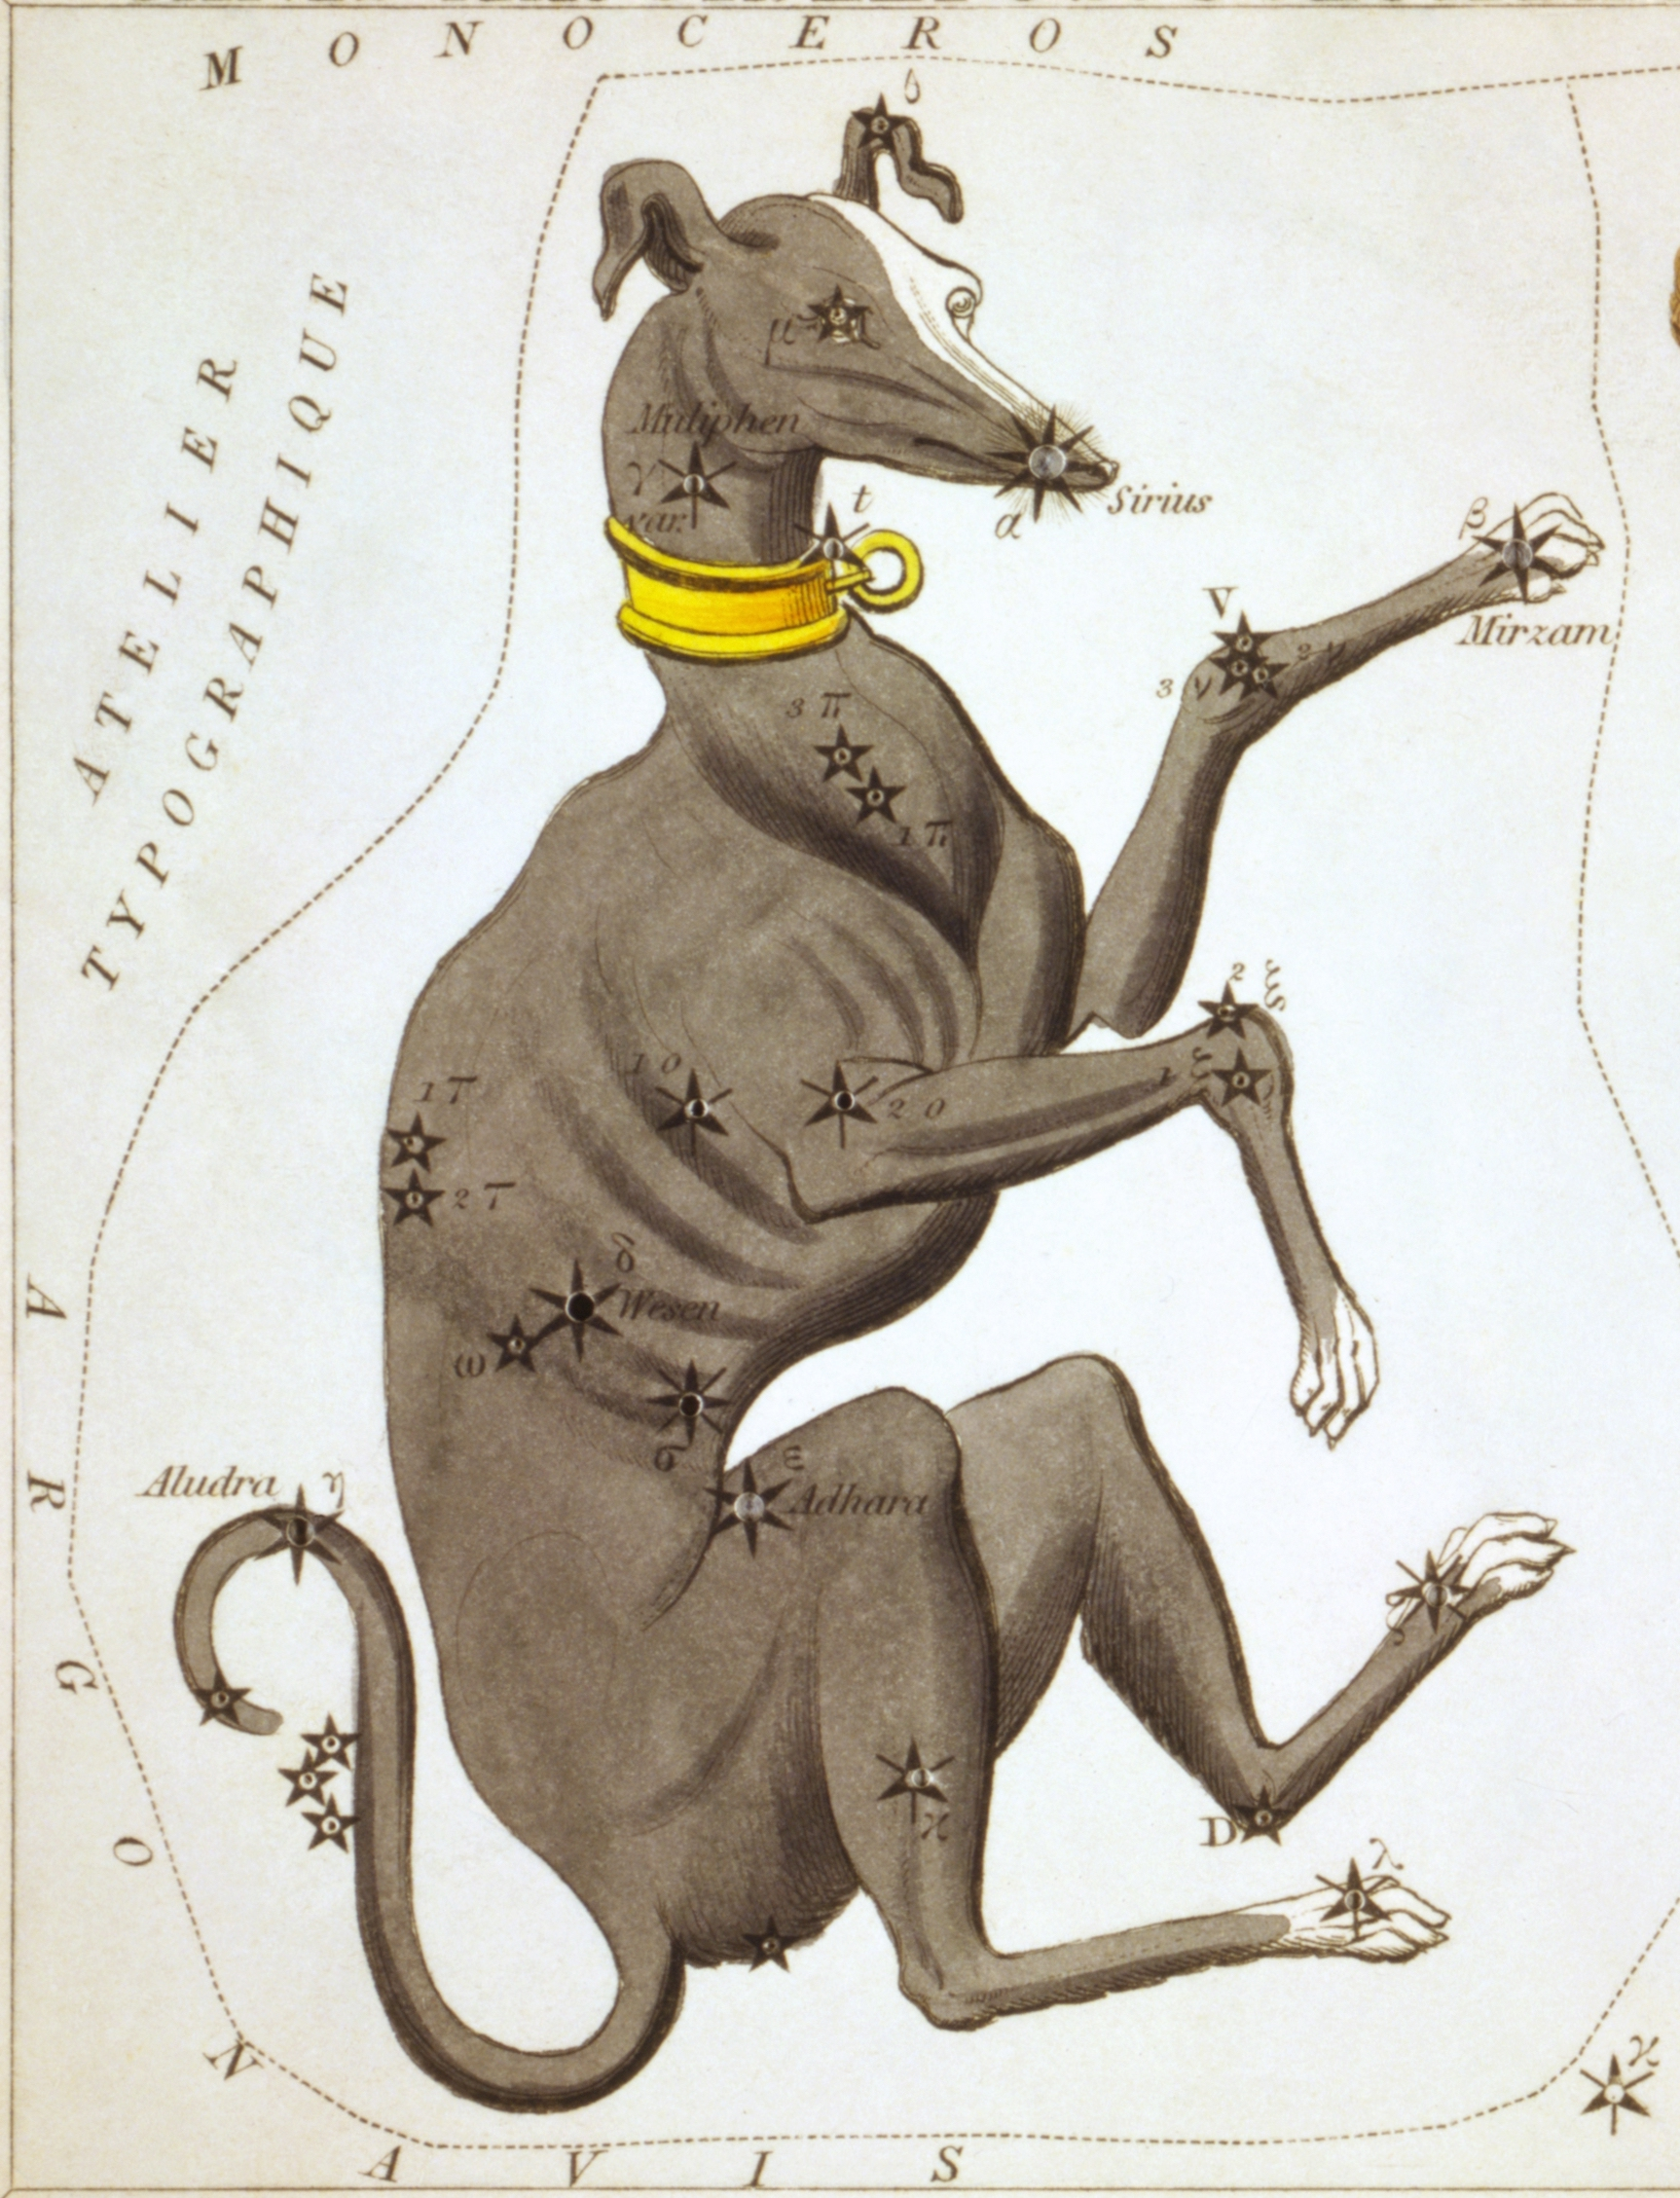 Sidney_Hall_-_Urania's_Mirror_-_Canis_Major,_Lepus,_Columba_Noachi_&_Cela_Sculptoris copy.jpg